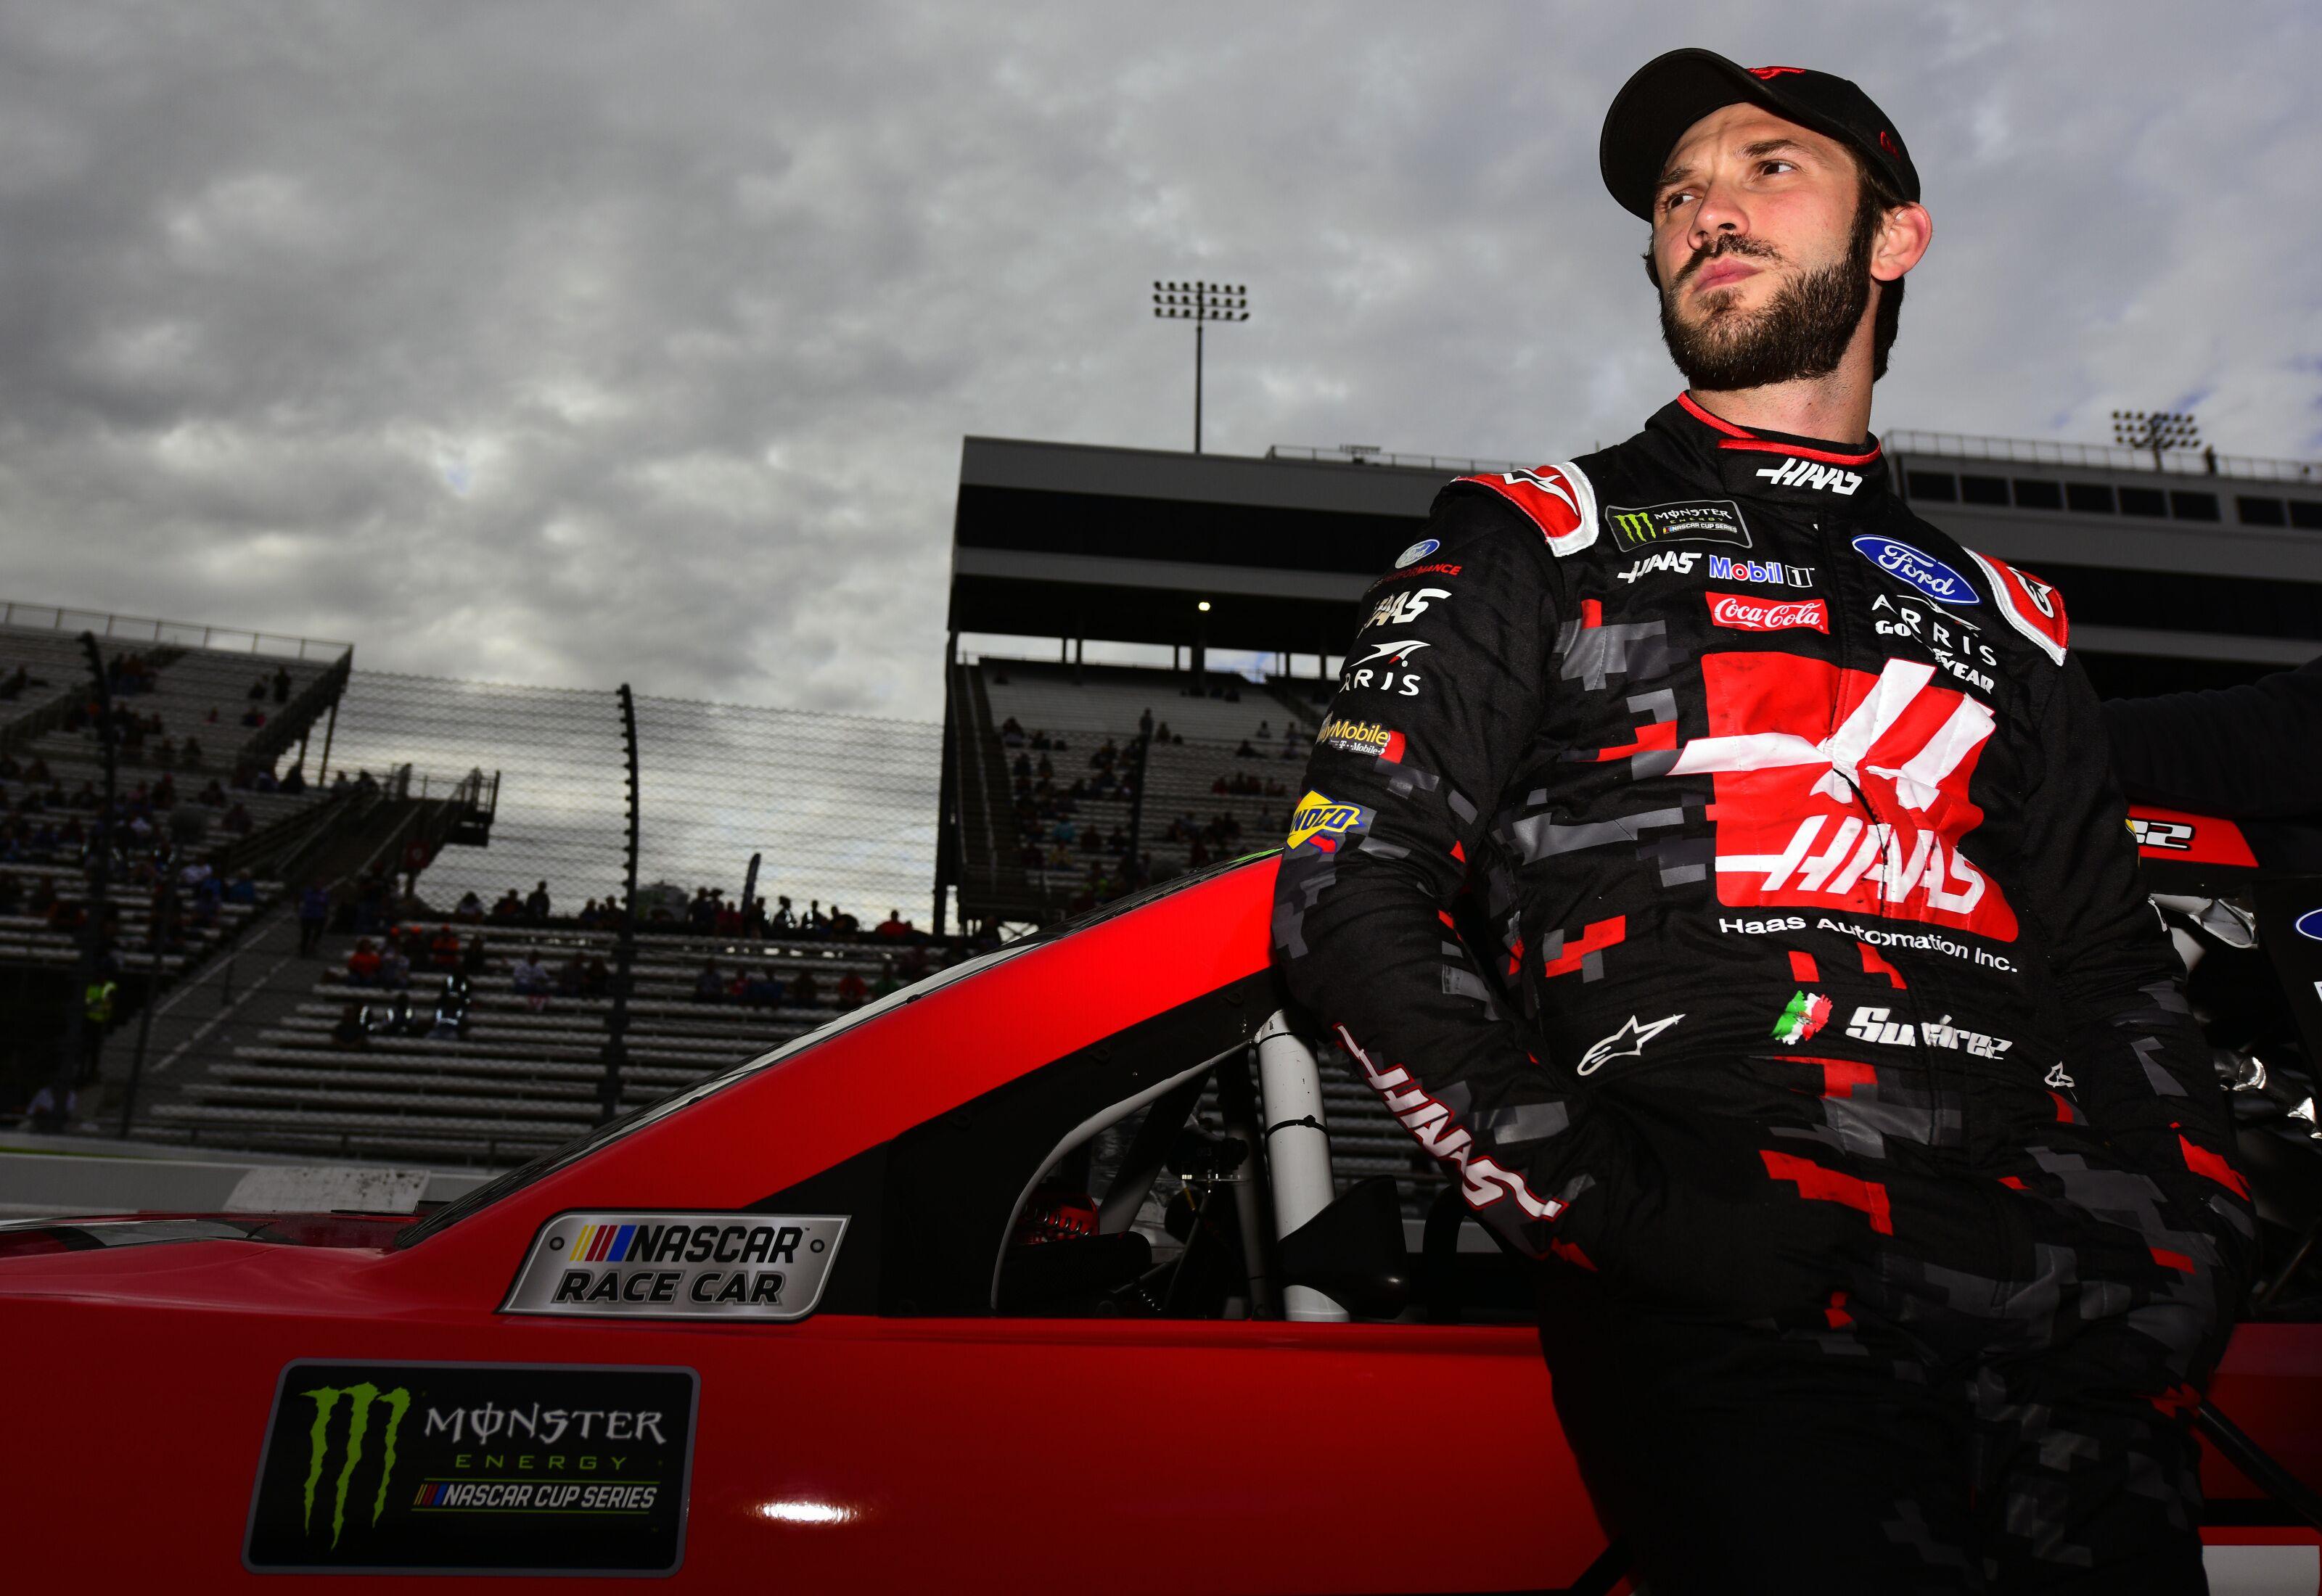 NASCAR: Out of a ride, what's next for Daniel Suarez?